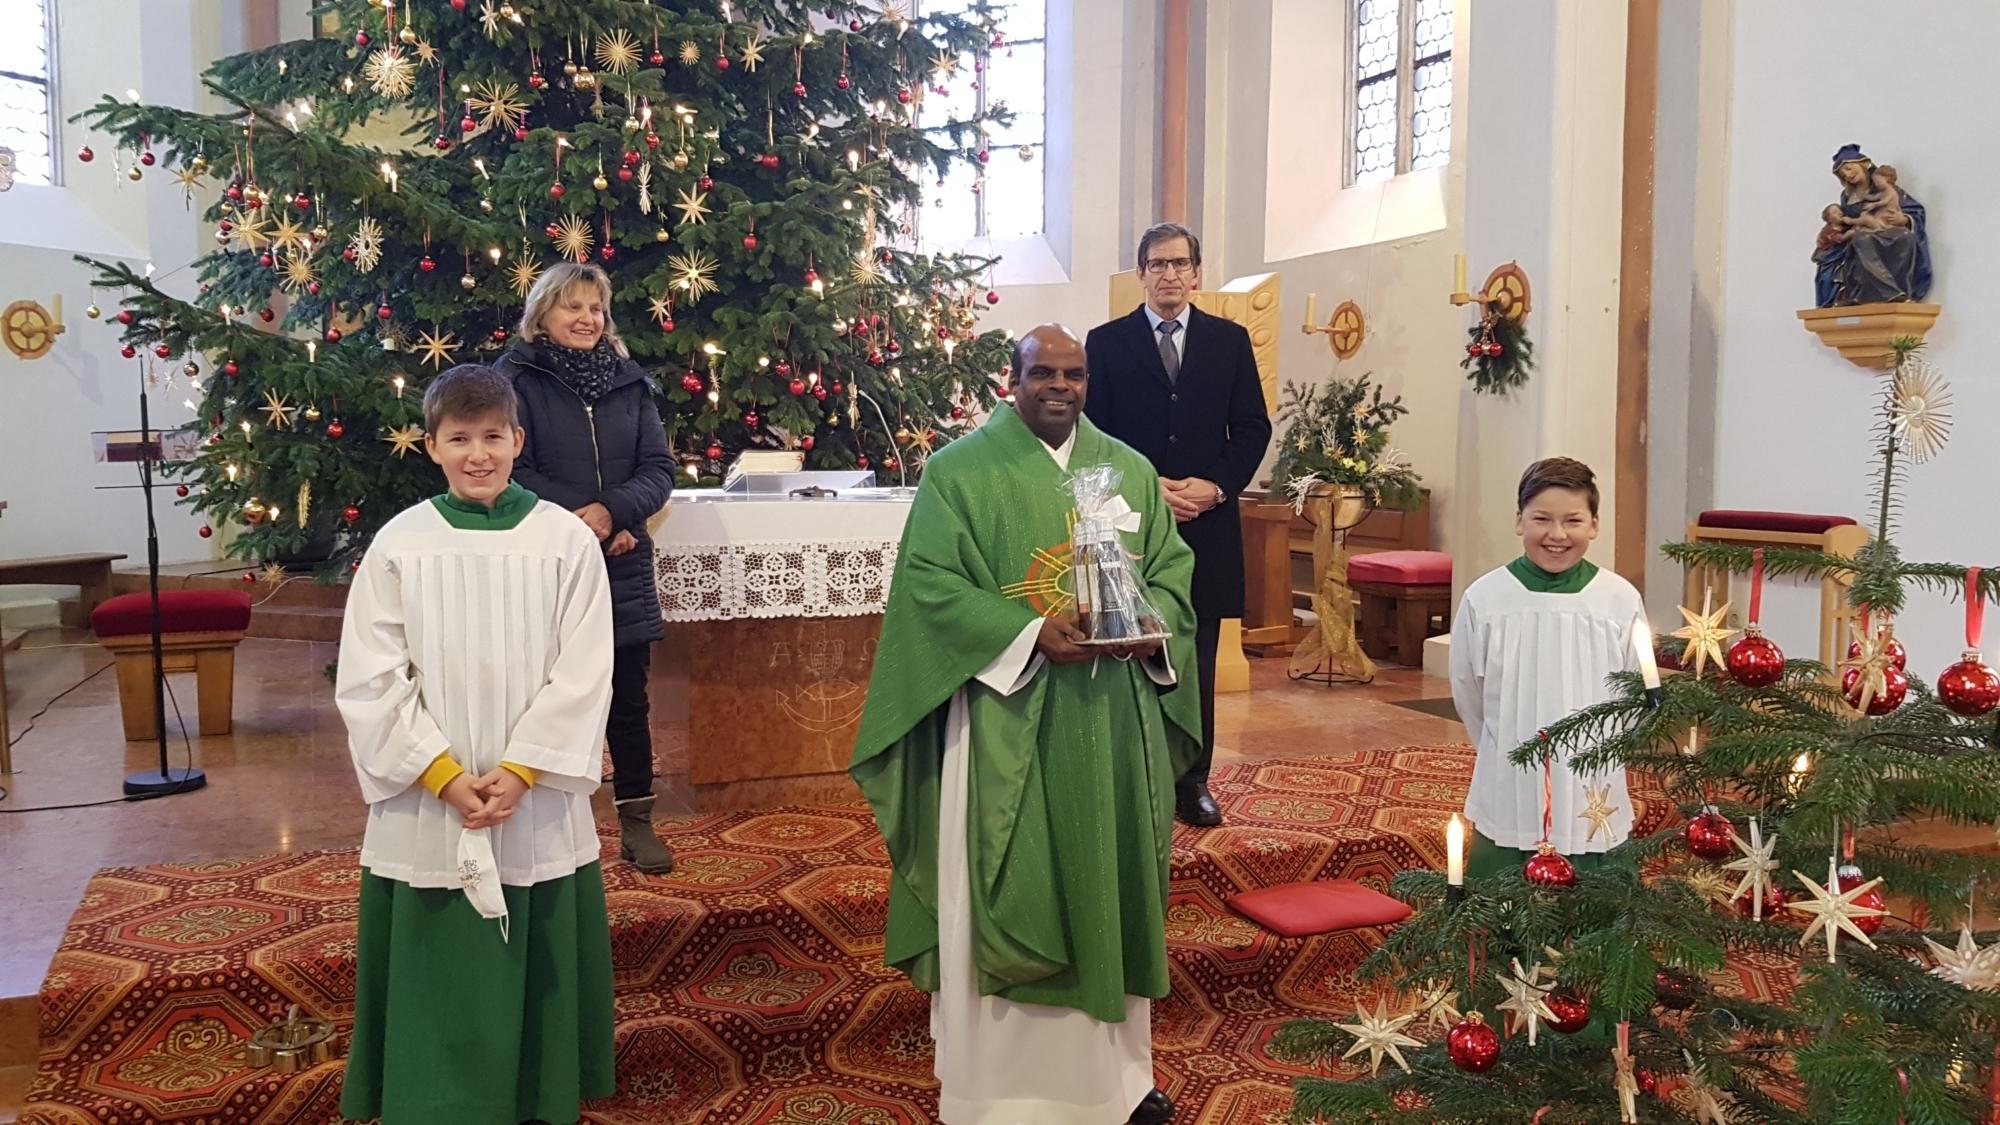 30 Priesterjubiläum Pfr Joseph